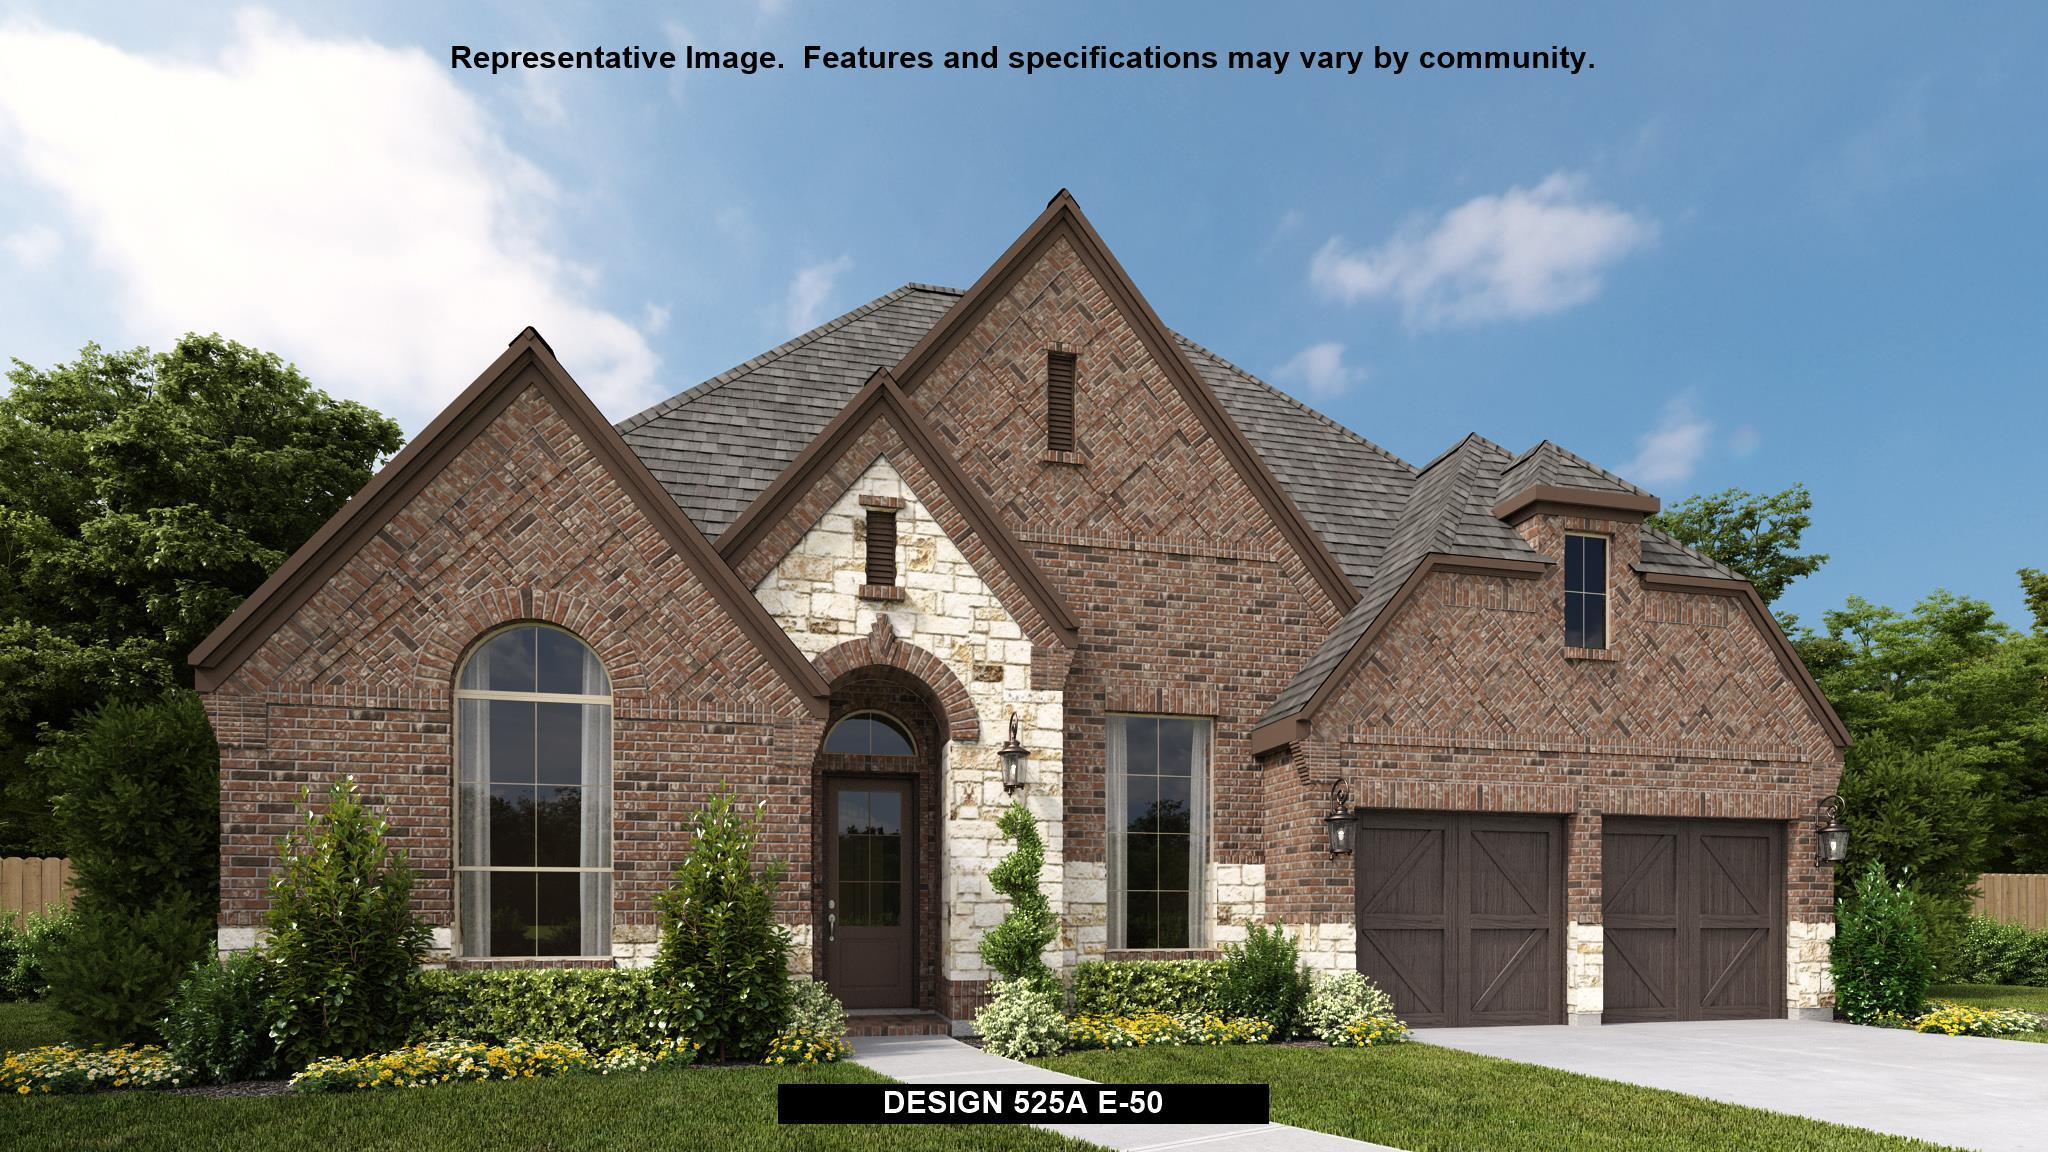 525A-Design-at-Windsong Ranch-in-Prosper